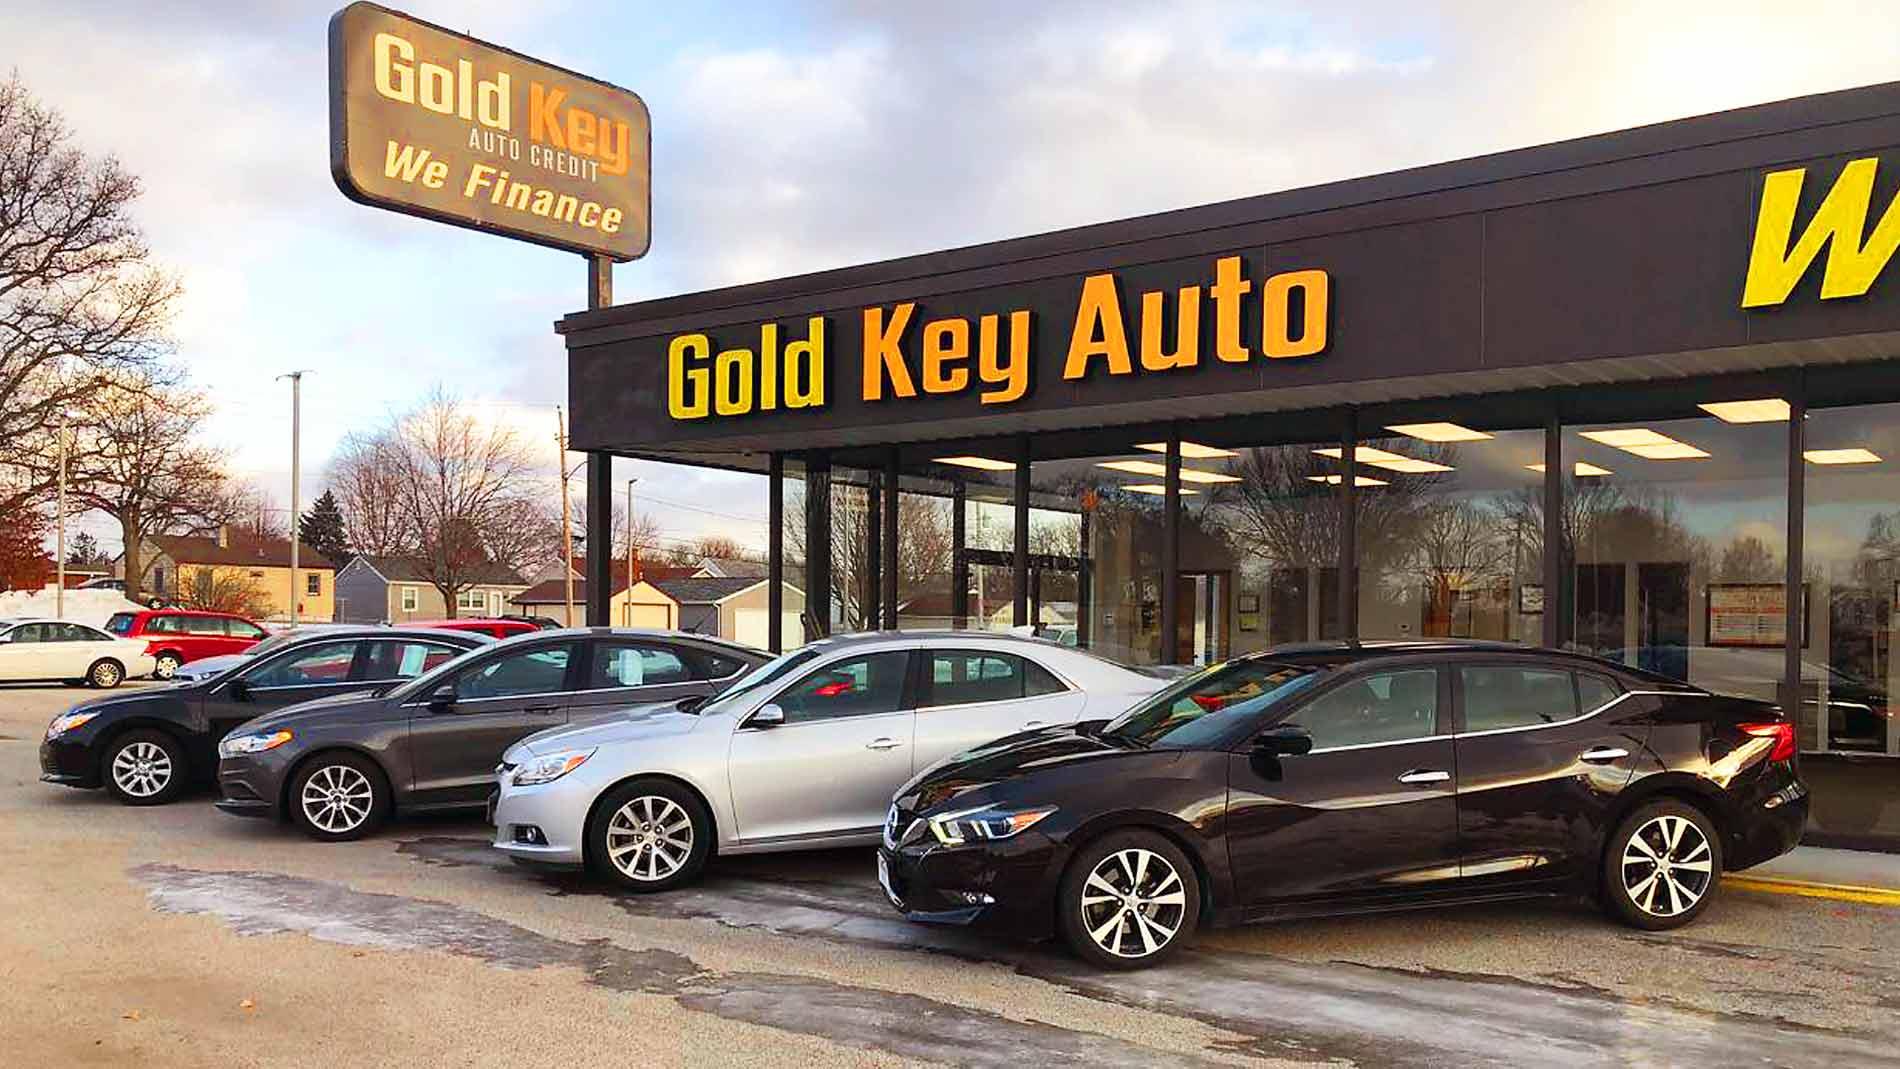 Goldkey Auto Sales Silvis Goldkey Auto Sales Silvis